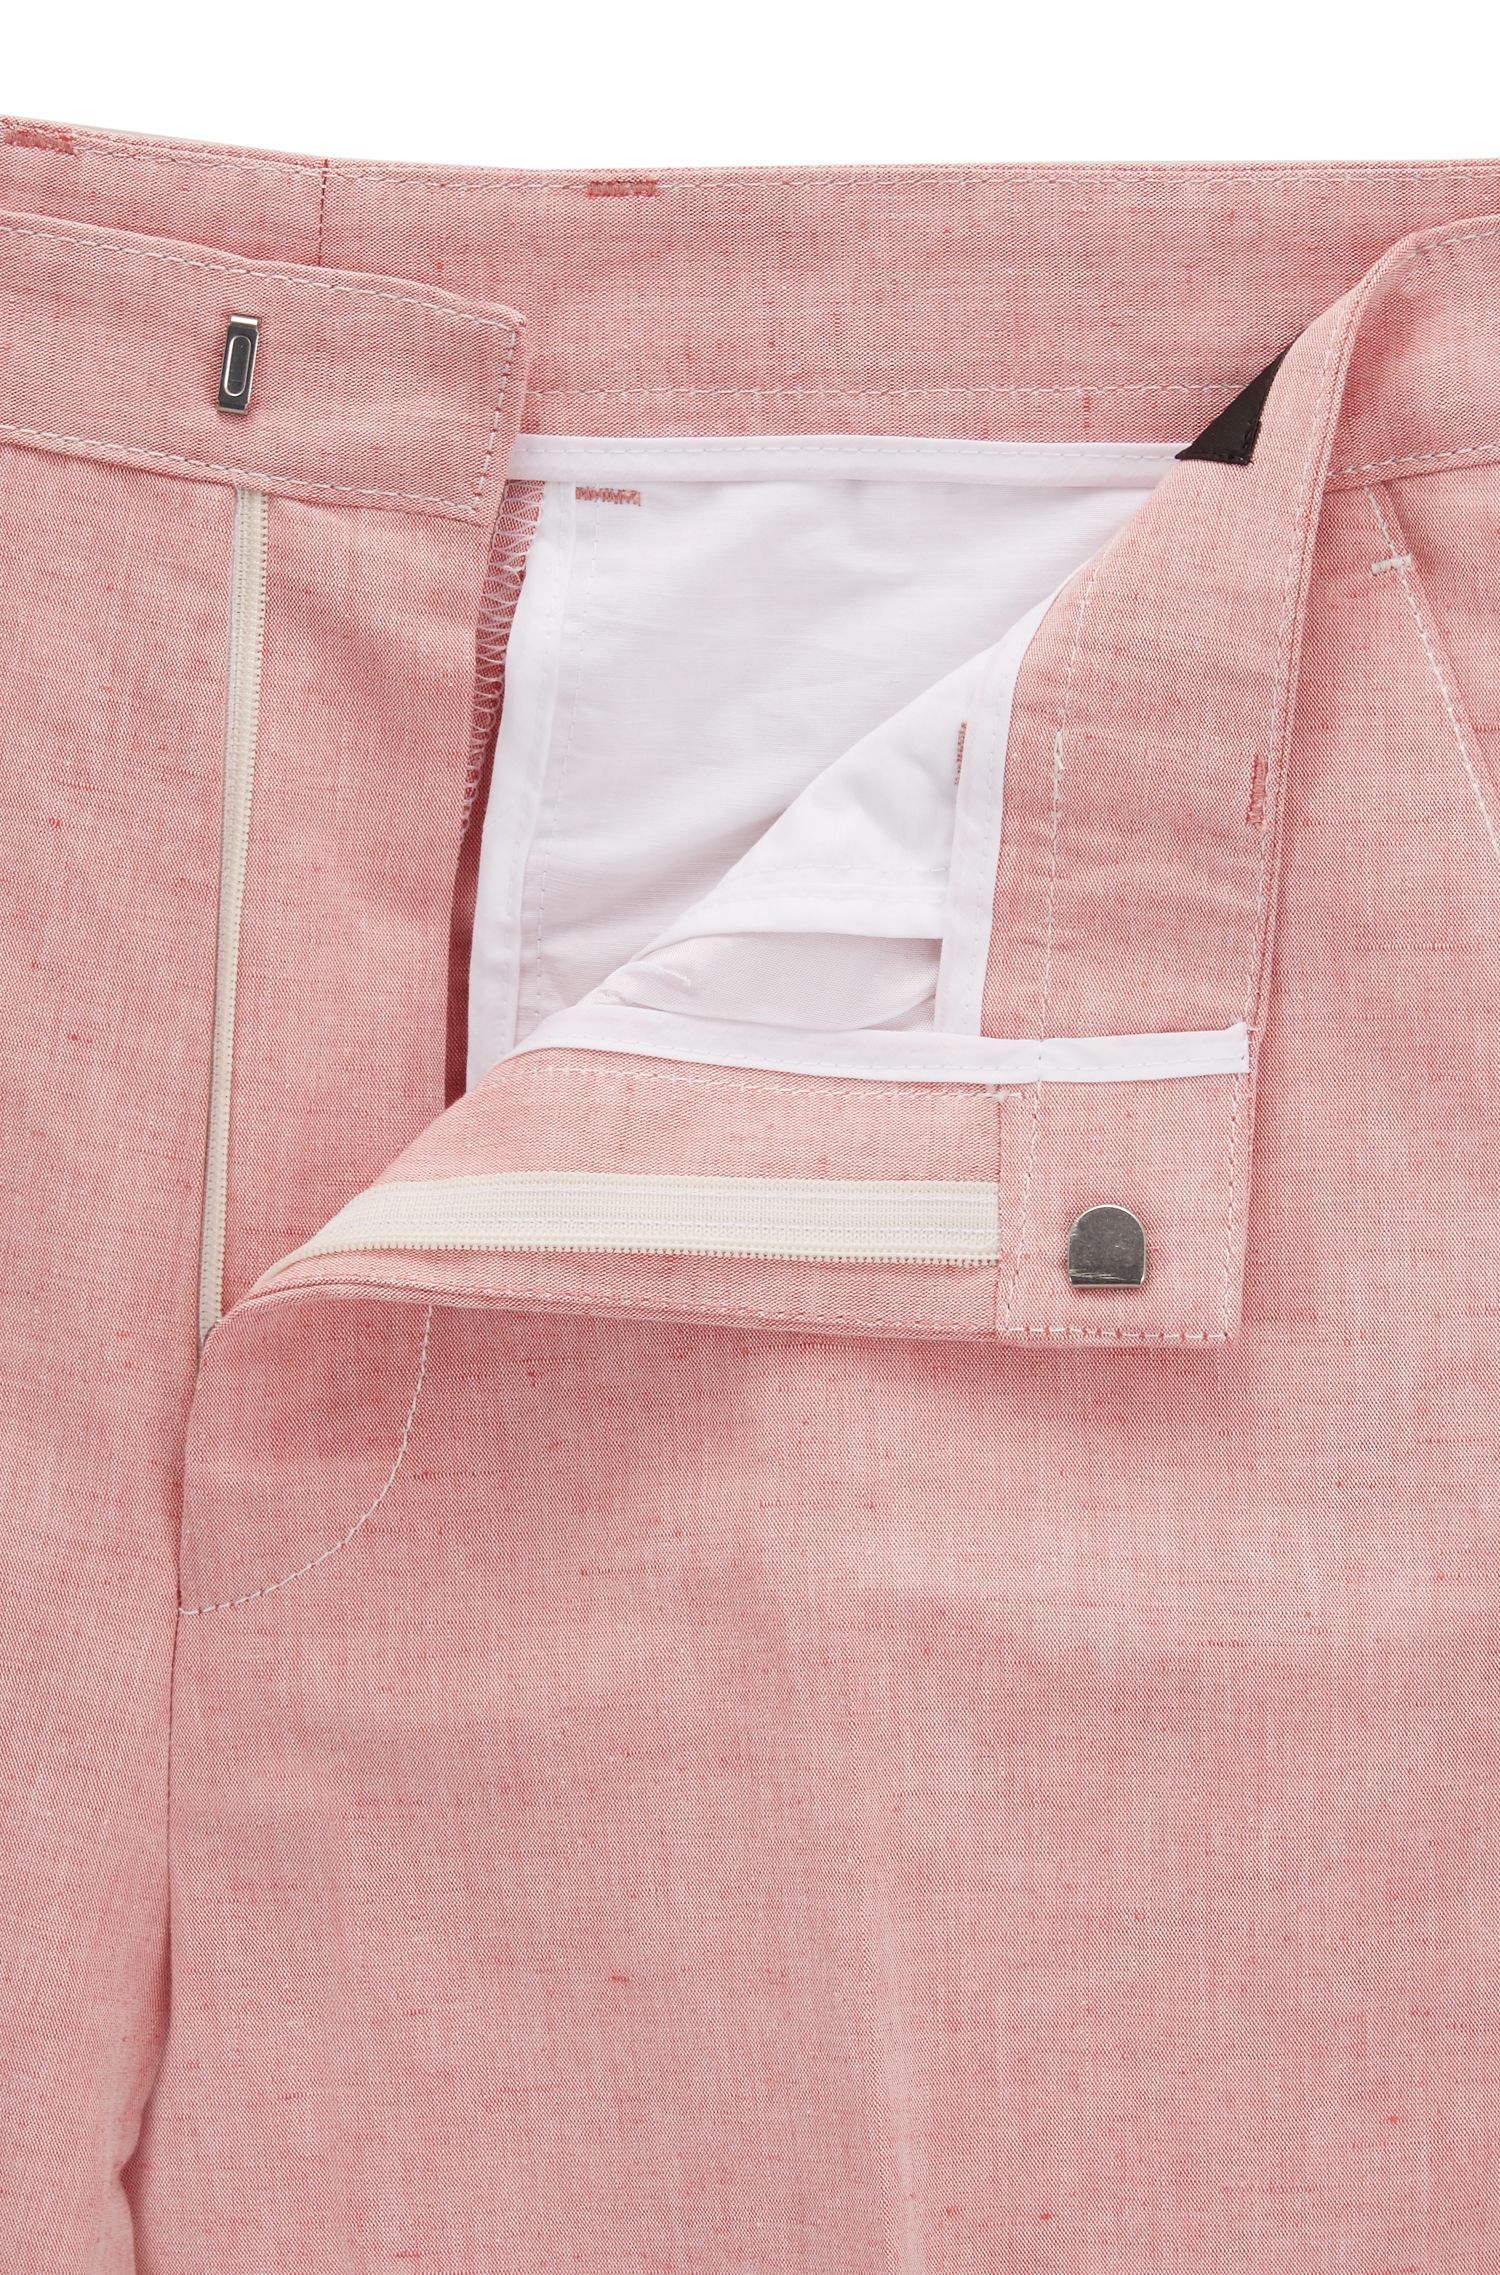 Linen Cotton Dress Pant, Slim Fit | Pirko, Red